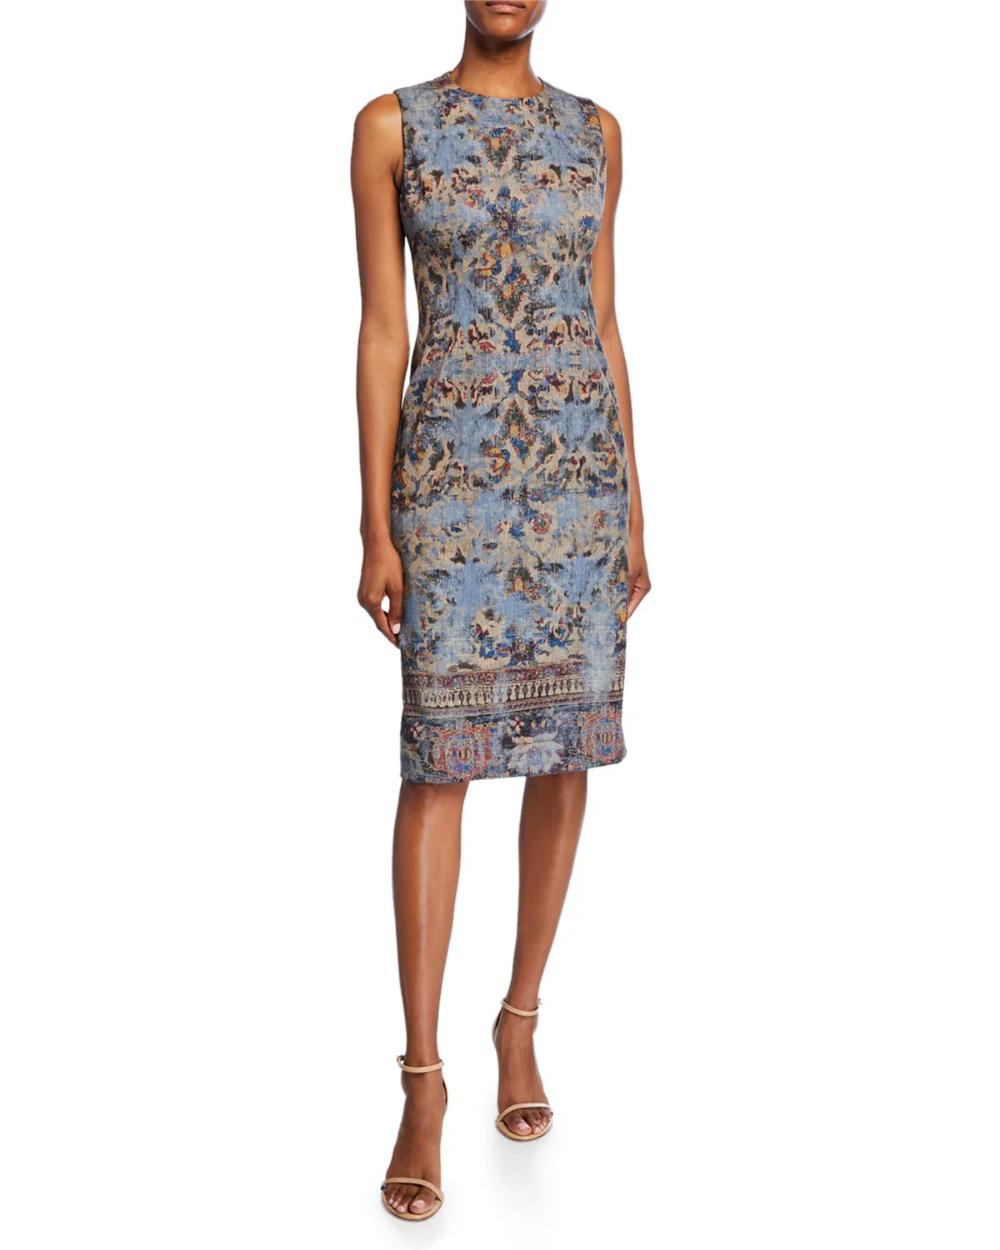 Kobi Halperin Sienna Sleeveless Sheath Dress Sleeveless Sheath Dress Kobi Halperin Printed Sheath Dresses [ 1250 x 1000 Pixel ]